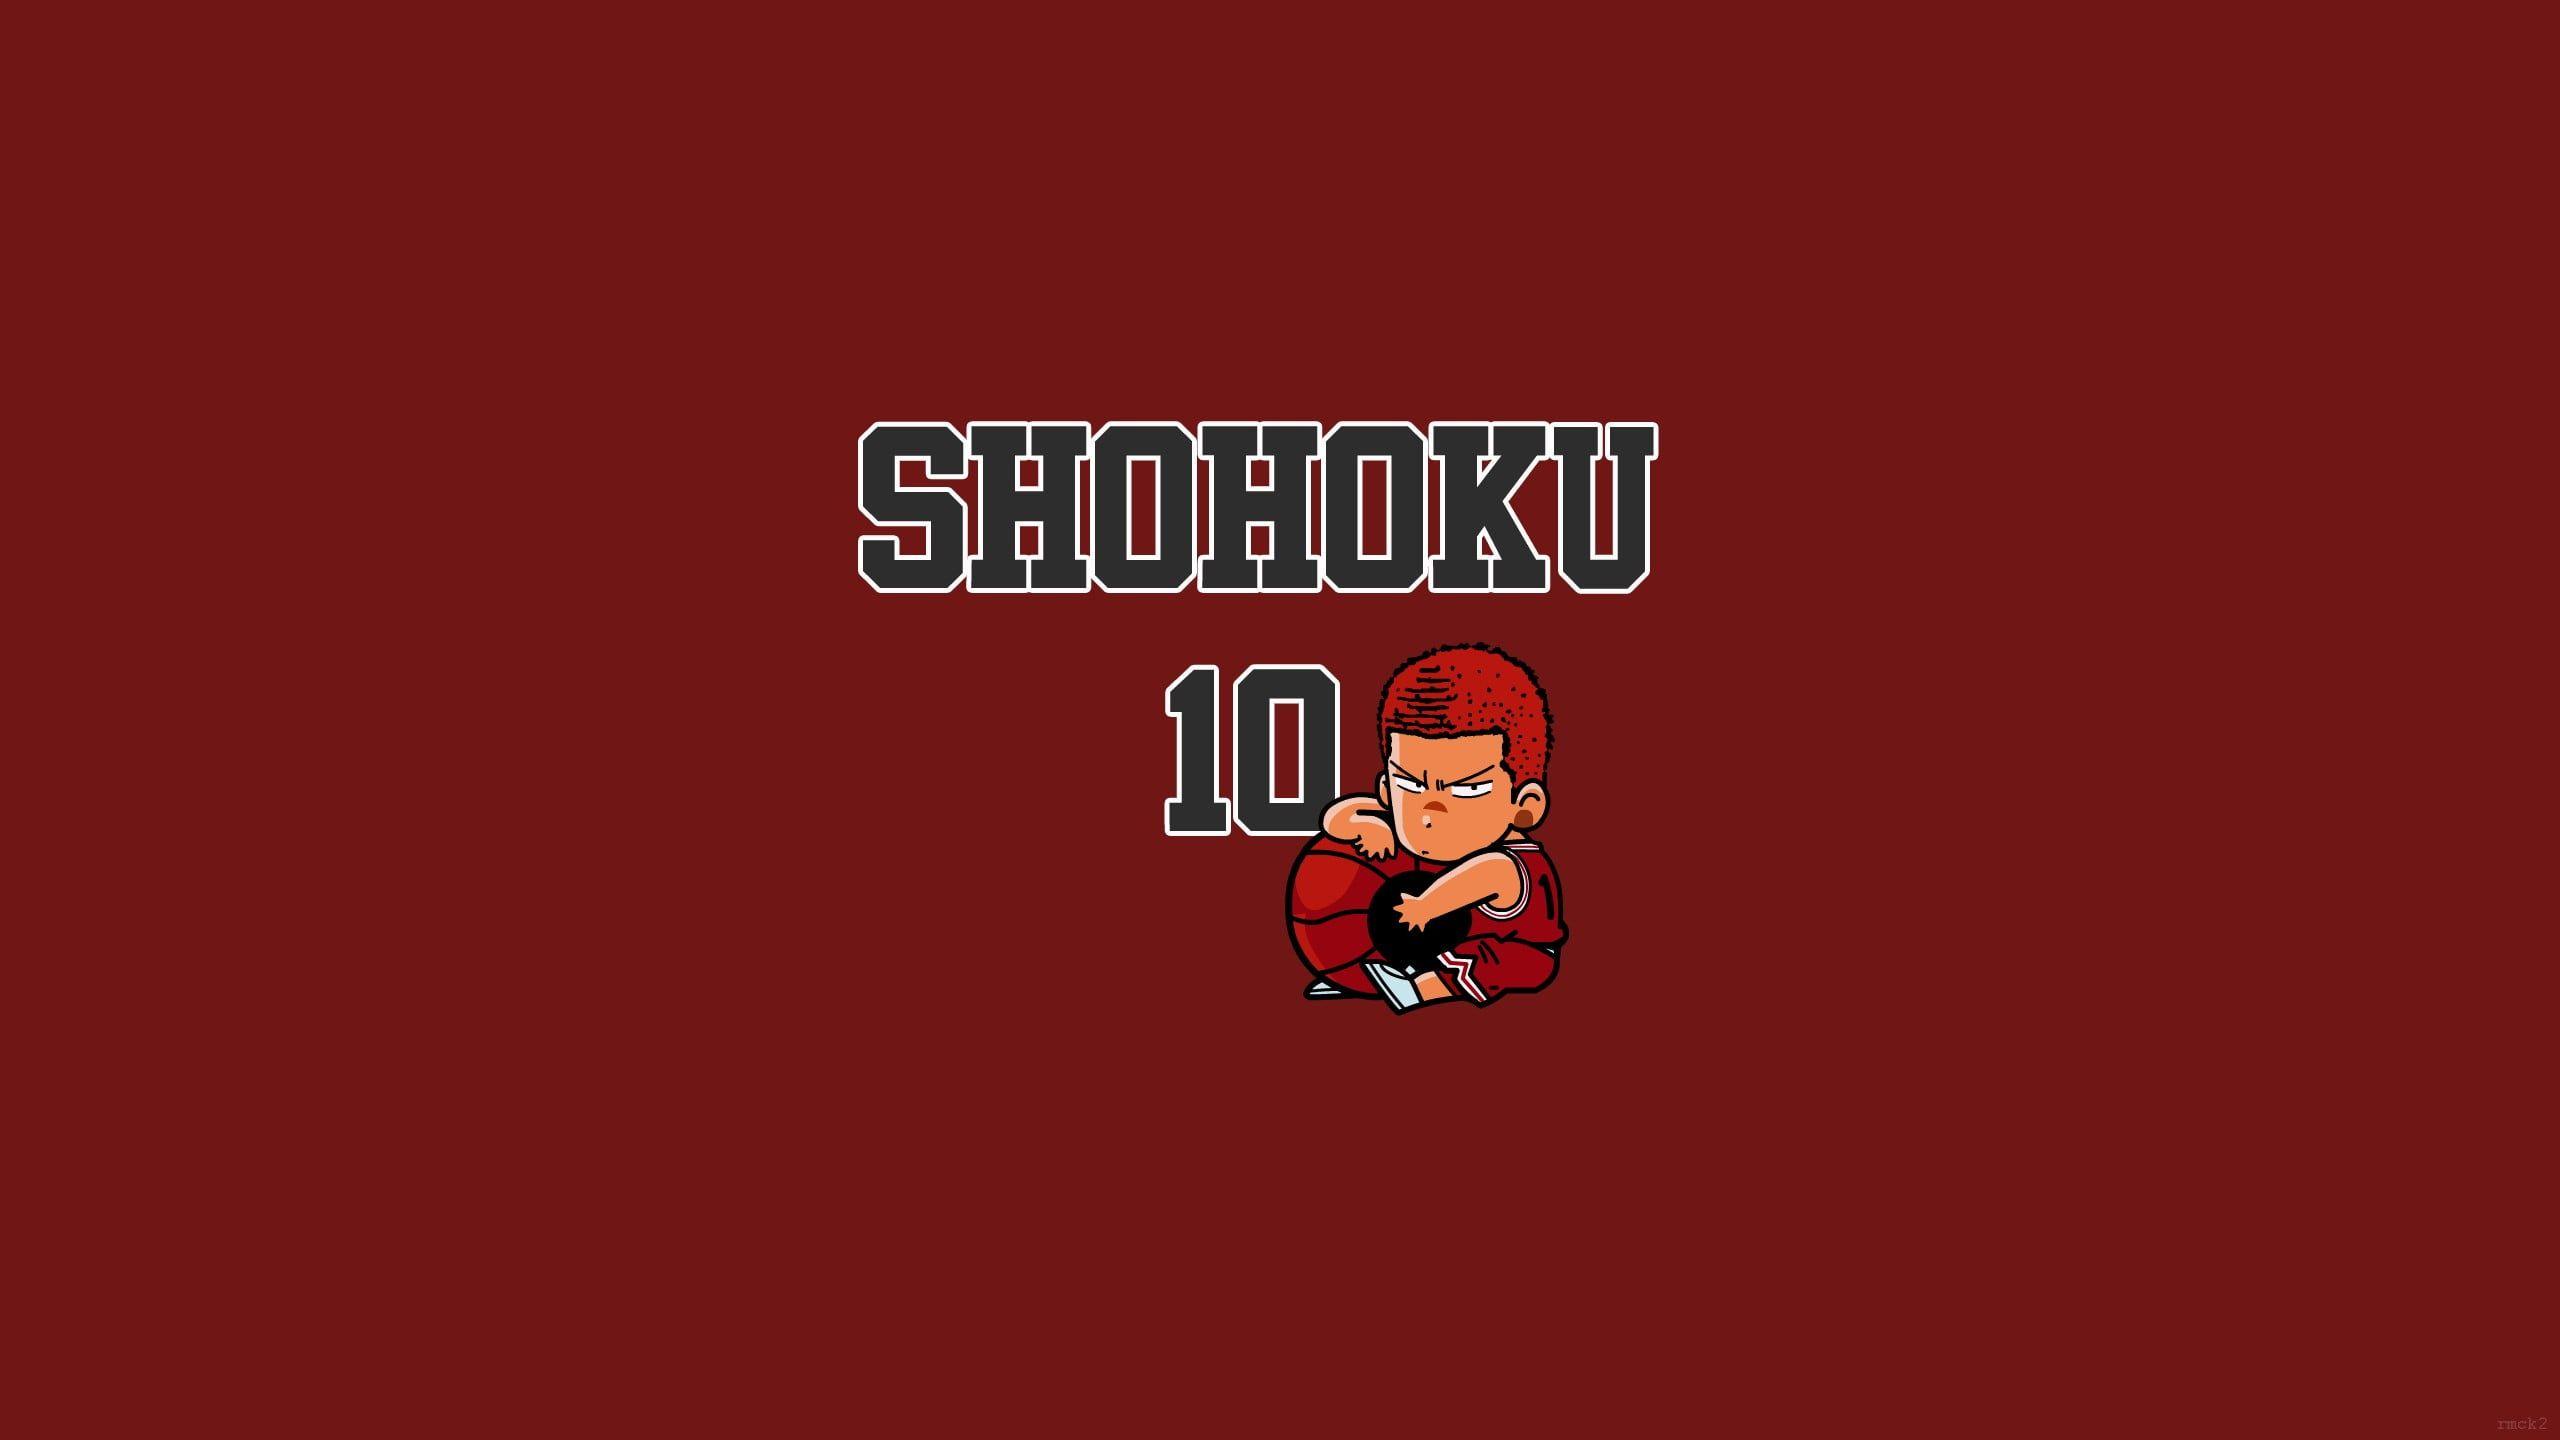 Red And Black Chicago Bulls Logo Slam Dunk Sakuragi Hanamichi Shohoku High 2k Wallpaper Hdwallpaper Desktop In 2020 Slam Dunk Chicago Bulls Logo Slam Dunk Anime